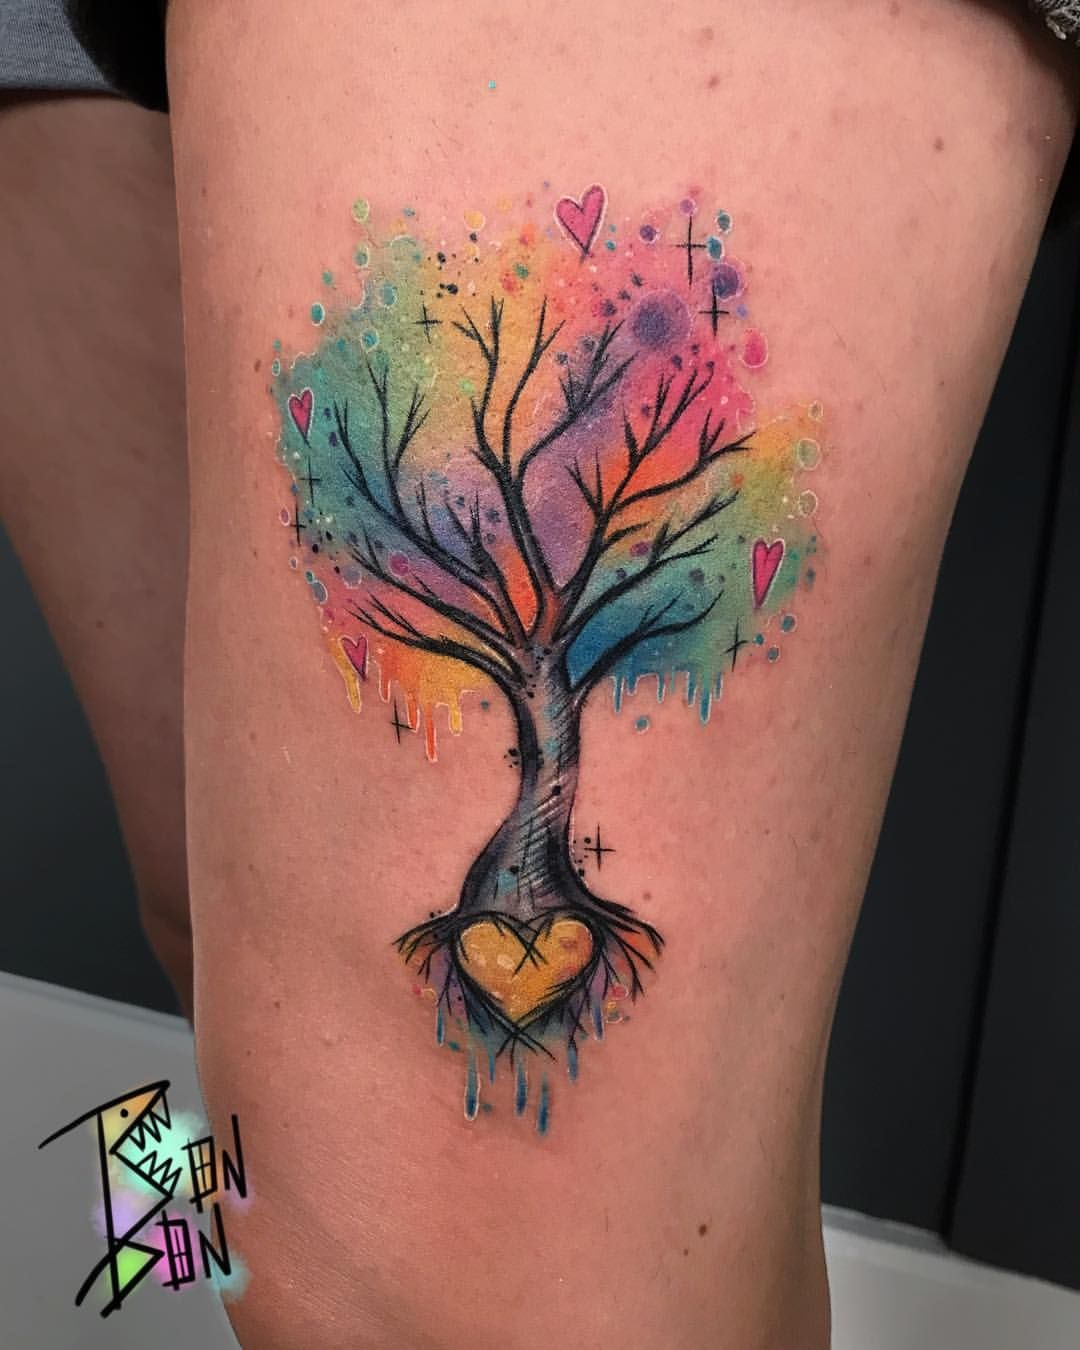 Family Tree For Katie Bonbonbizarre Houseofwolves Houseofwolvestattoo Rainbow Tree Rainbow Tattoos Mom Tattoos Life Tattoos